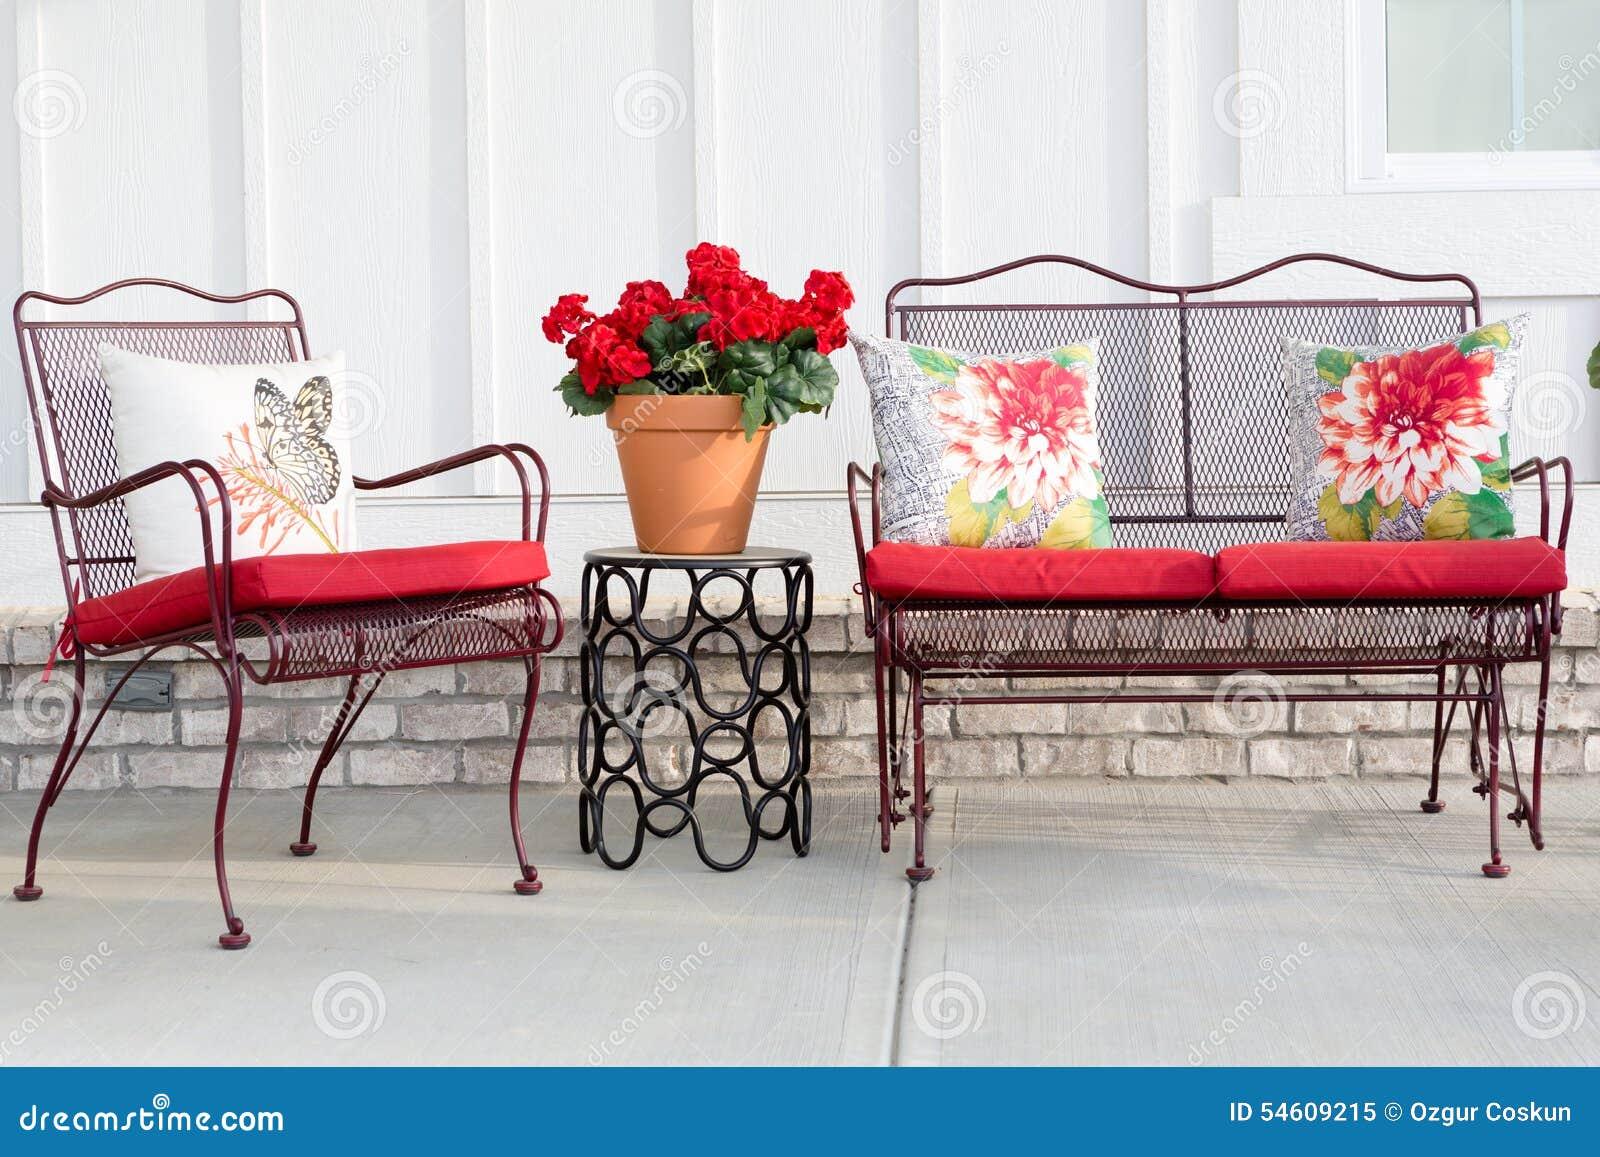 Colorful wrought iron garden furniture stock image image - Cojines para sofas de jardin ...